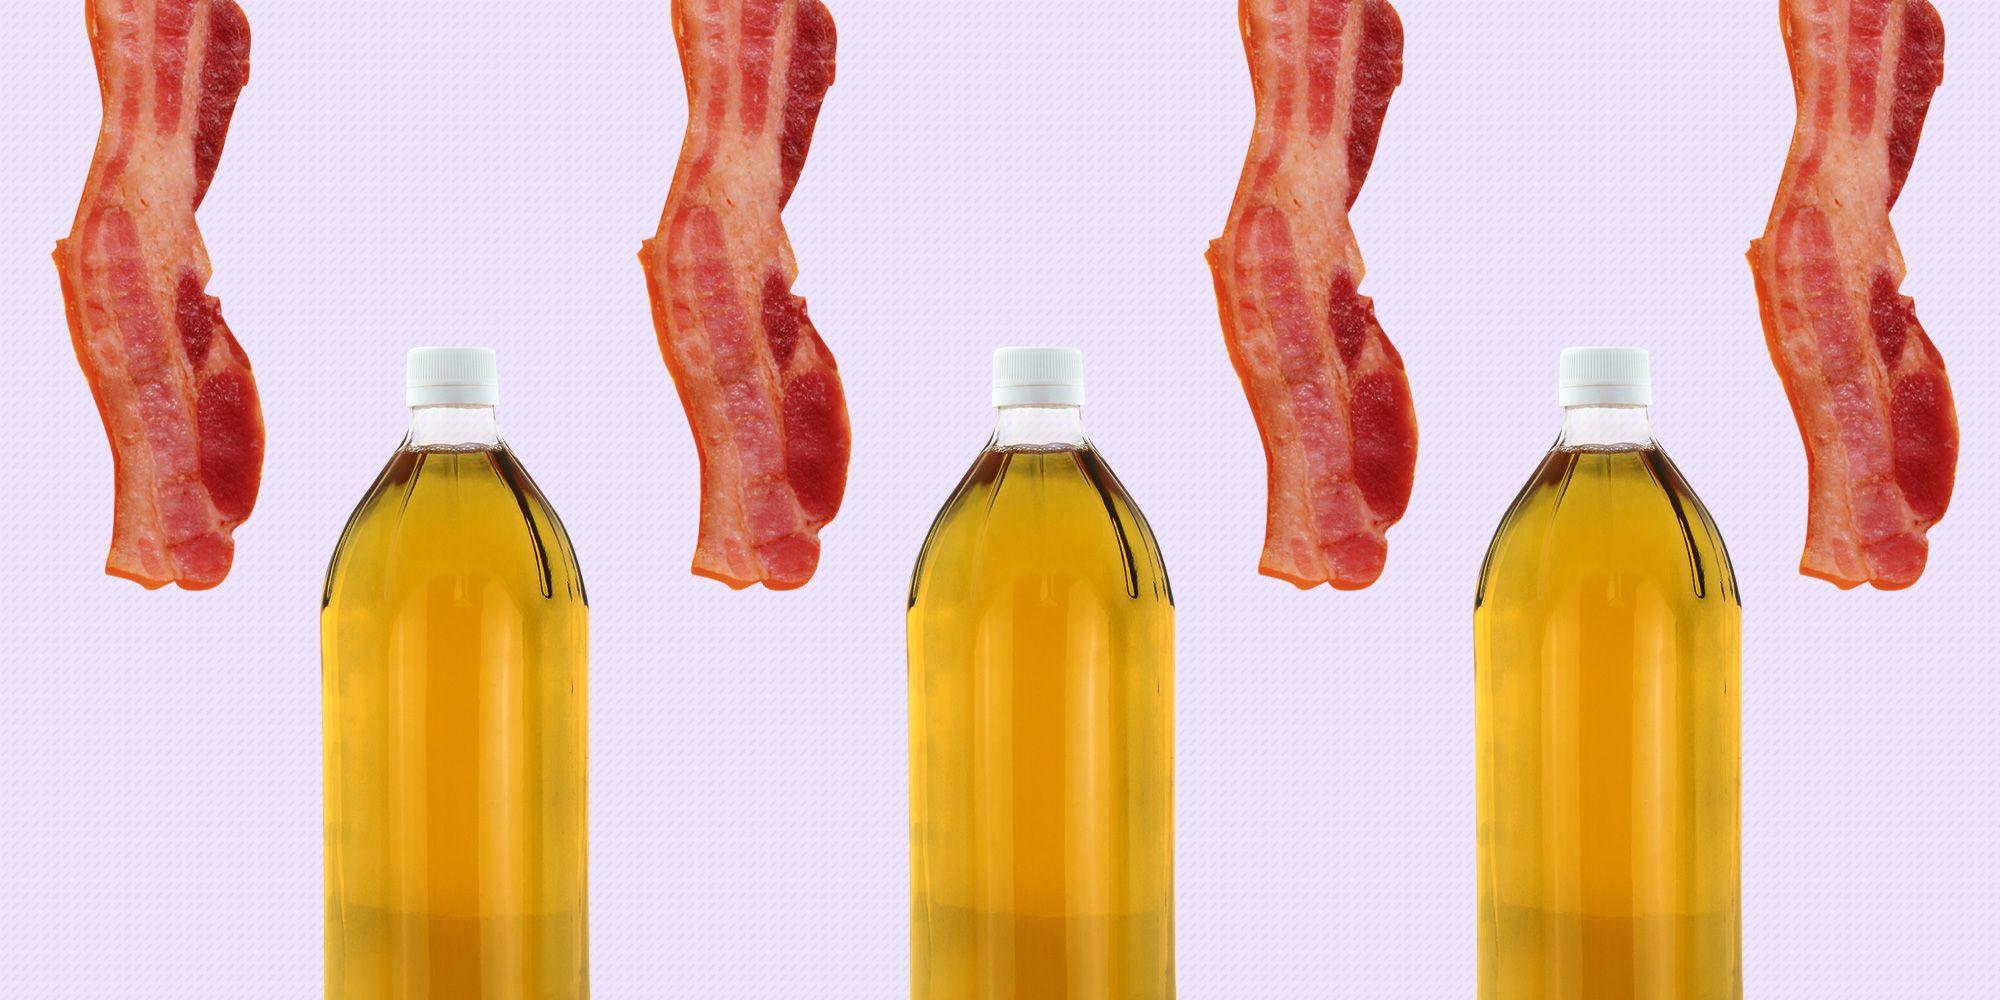 como preparar vinagre de sidra para adelgazar